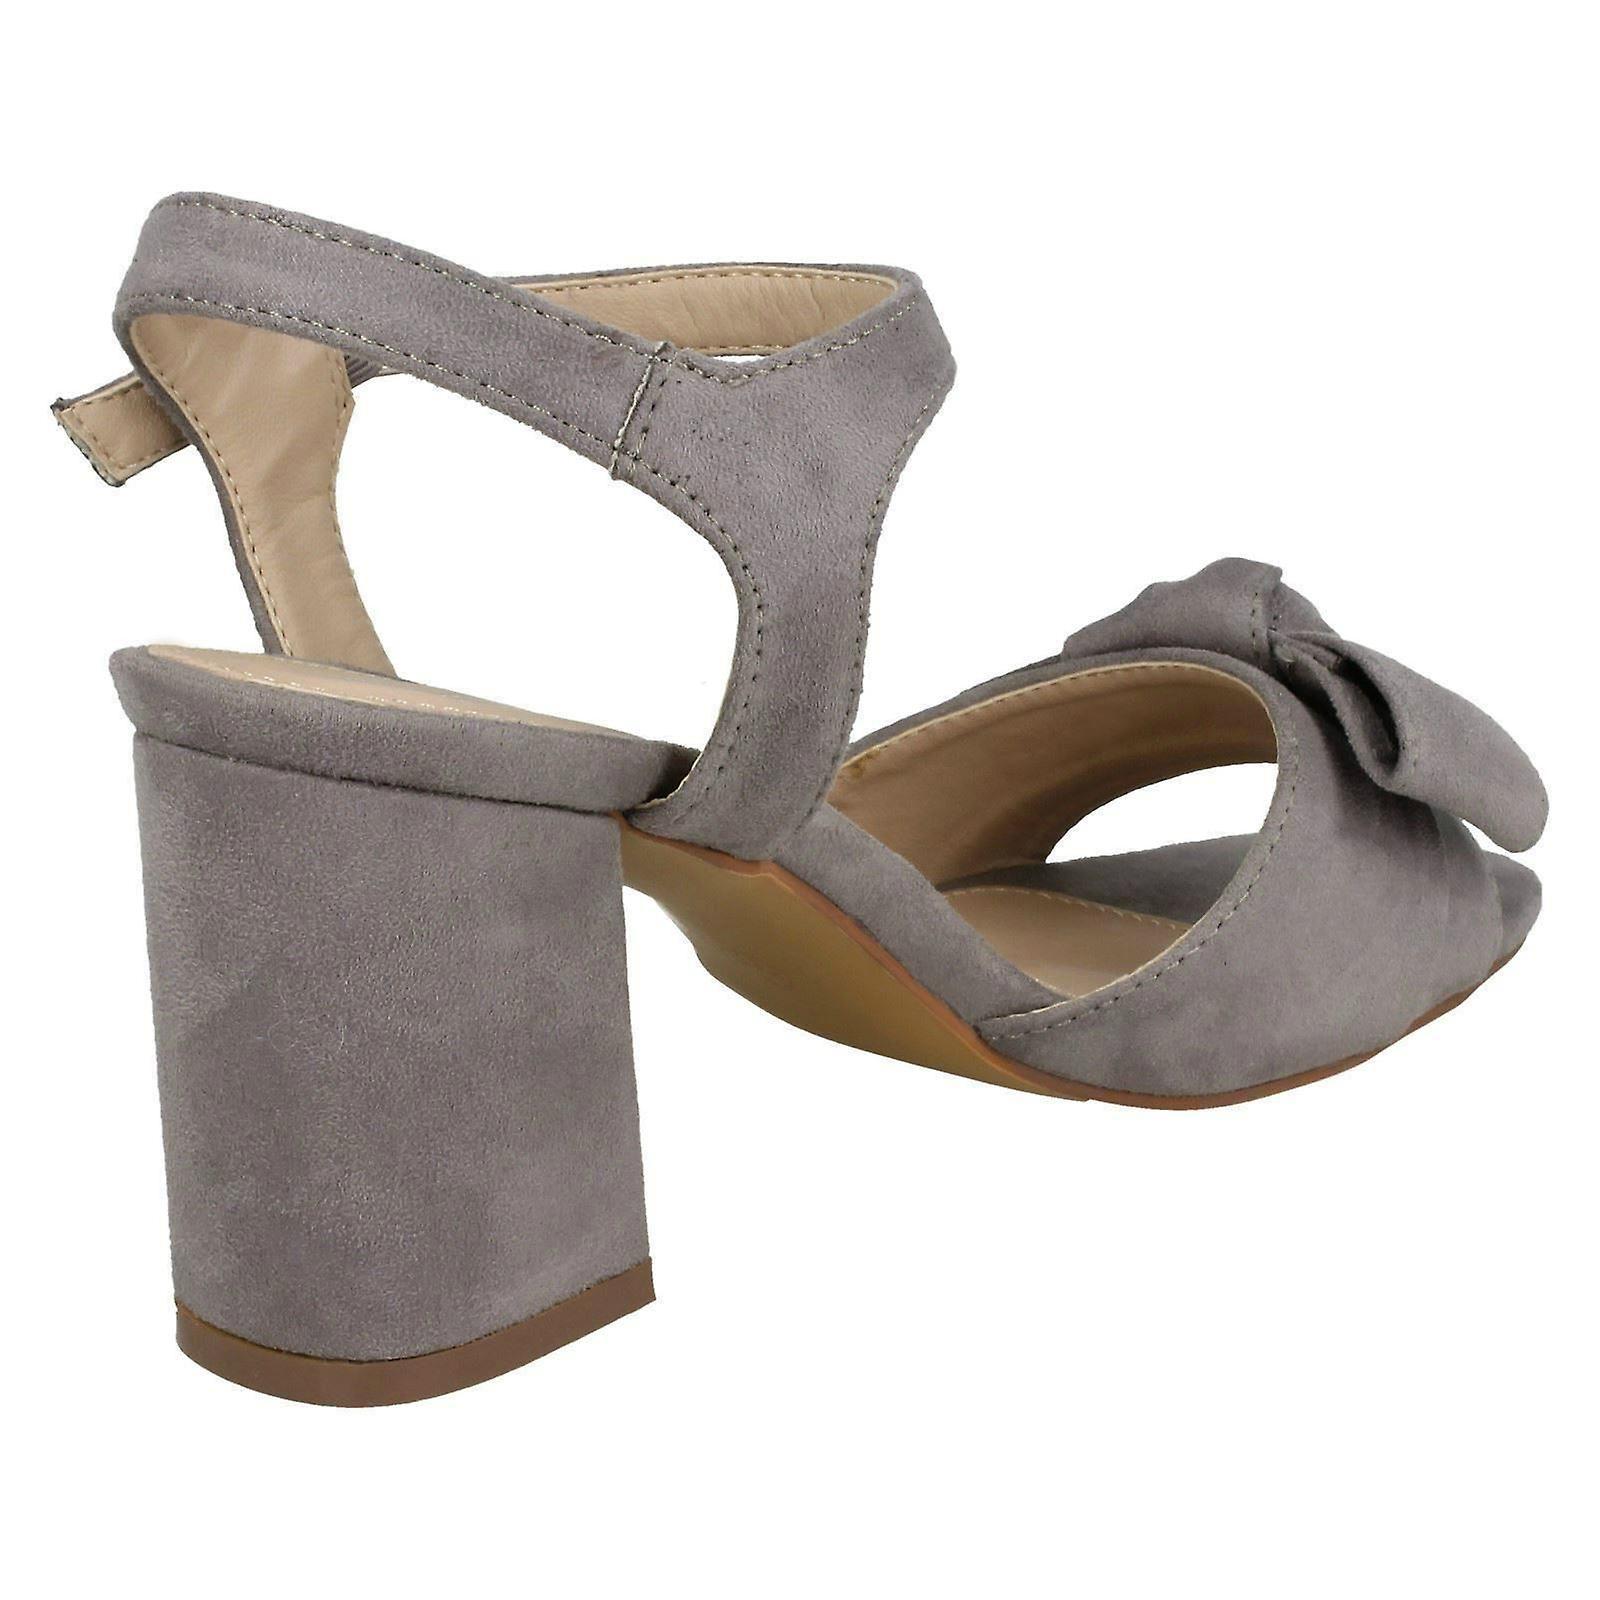 F10840 /'Ladies Spot On/' Blocked Heel Sandals